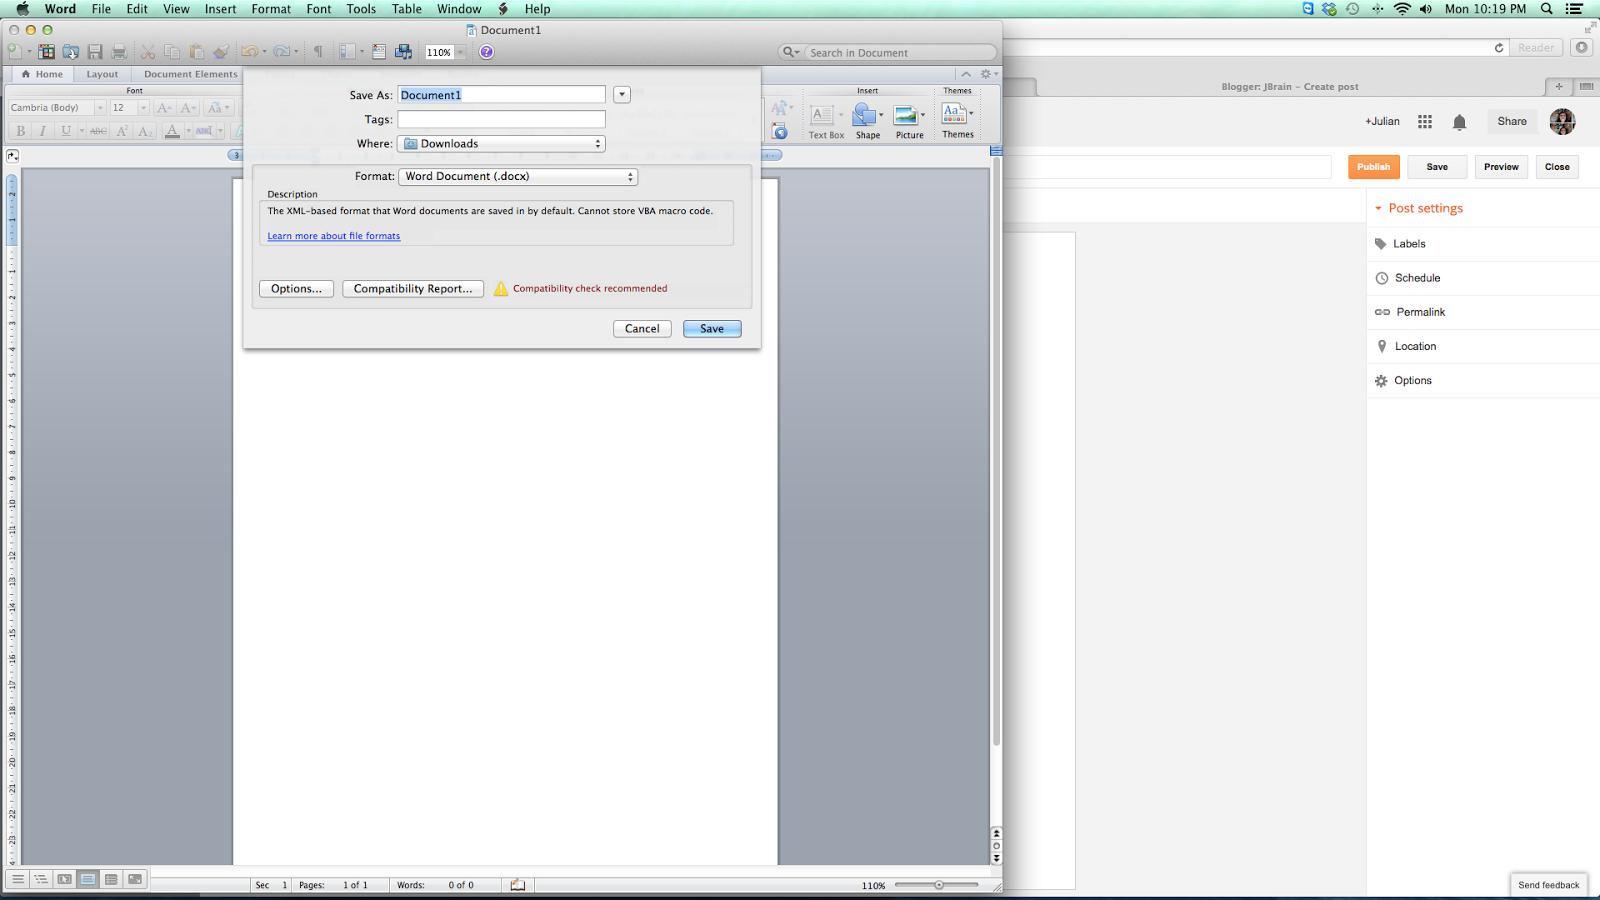 macbook save word document as a folder